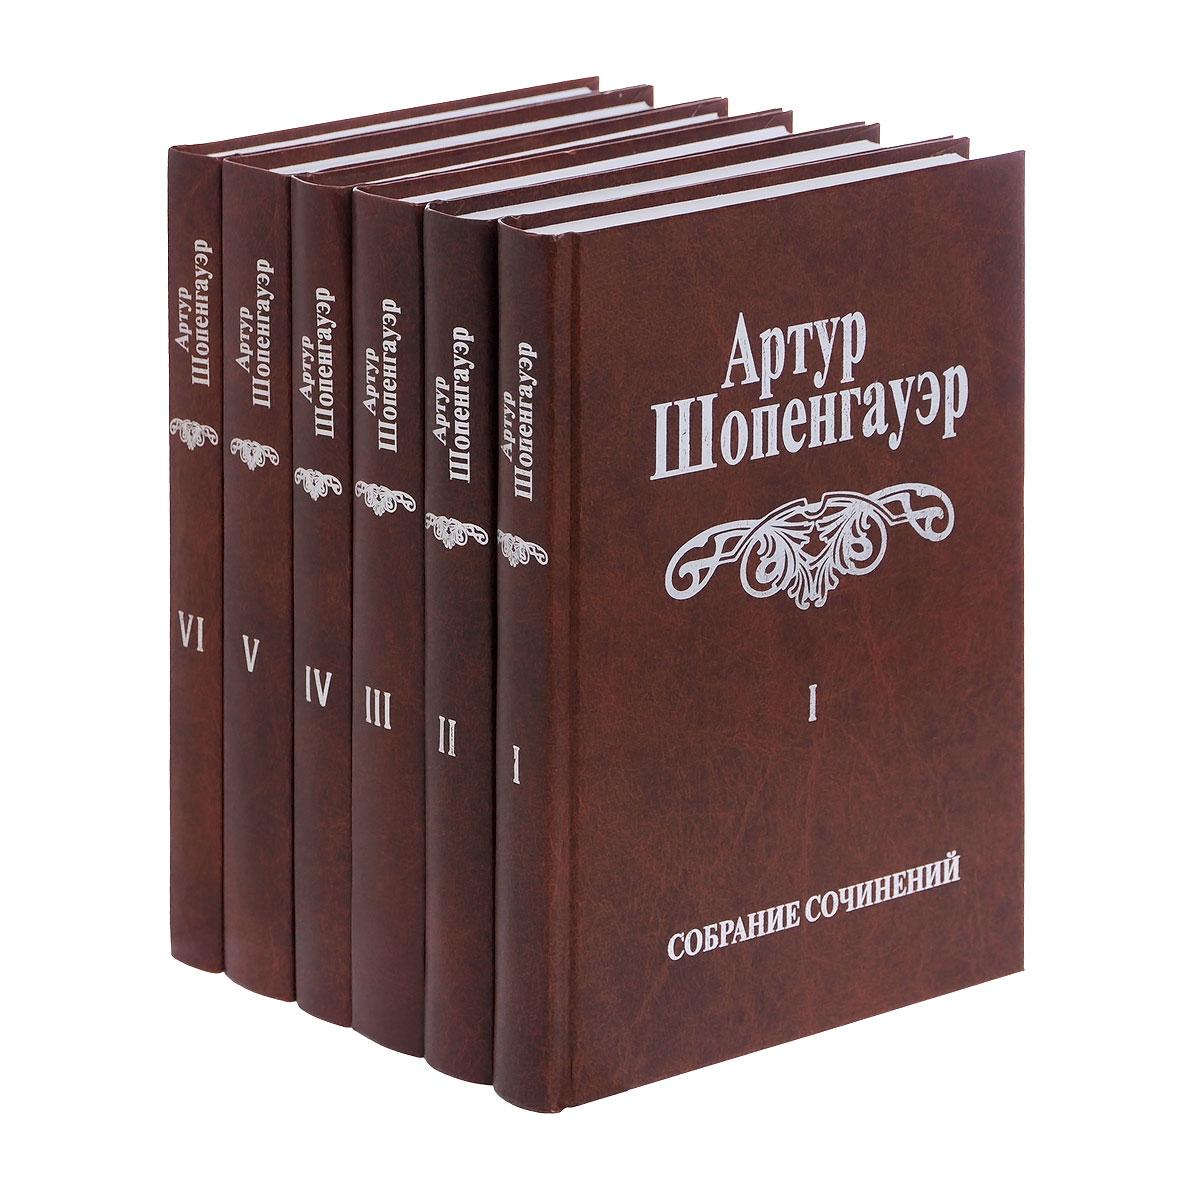 Артур Шопенгауэр Артур Шопенгауэр. Собрание сочинений в 6 томах (комплект из 6 книг) vermeer the complete works